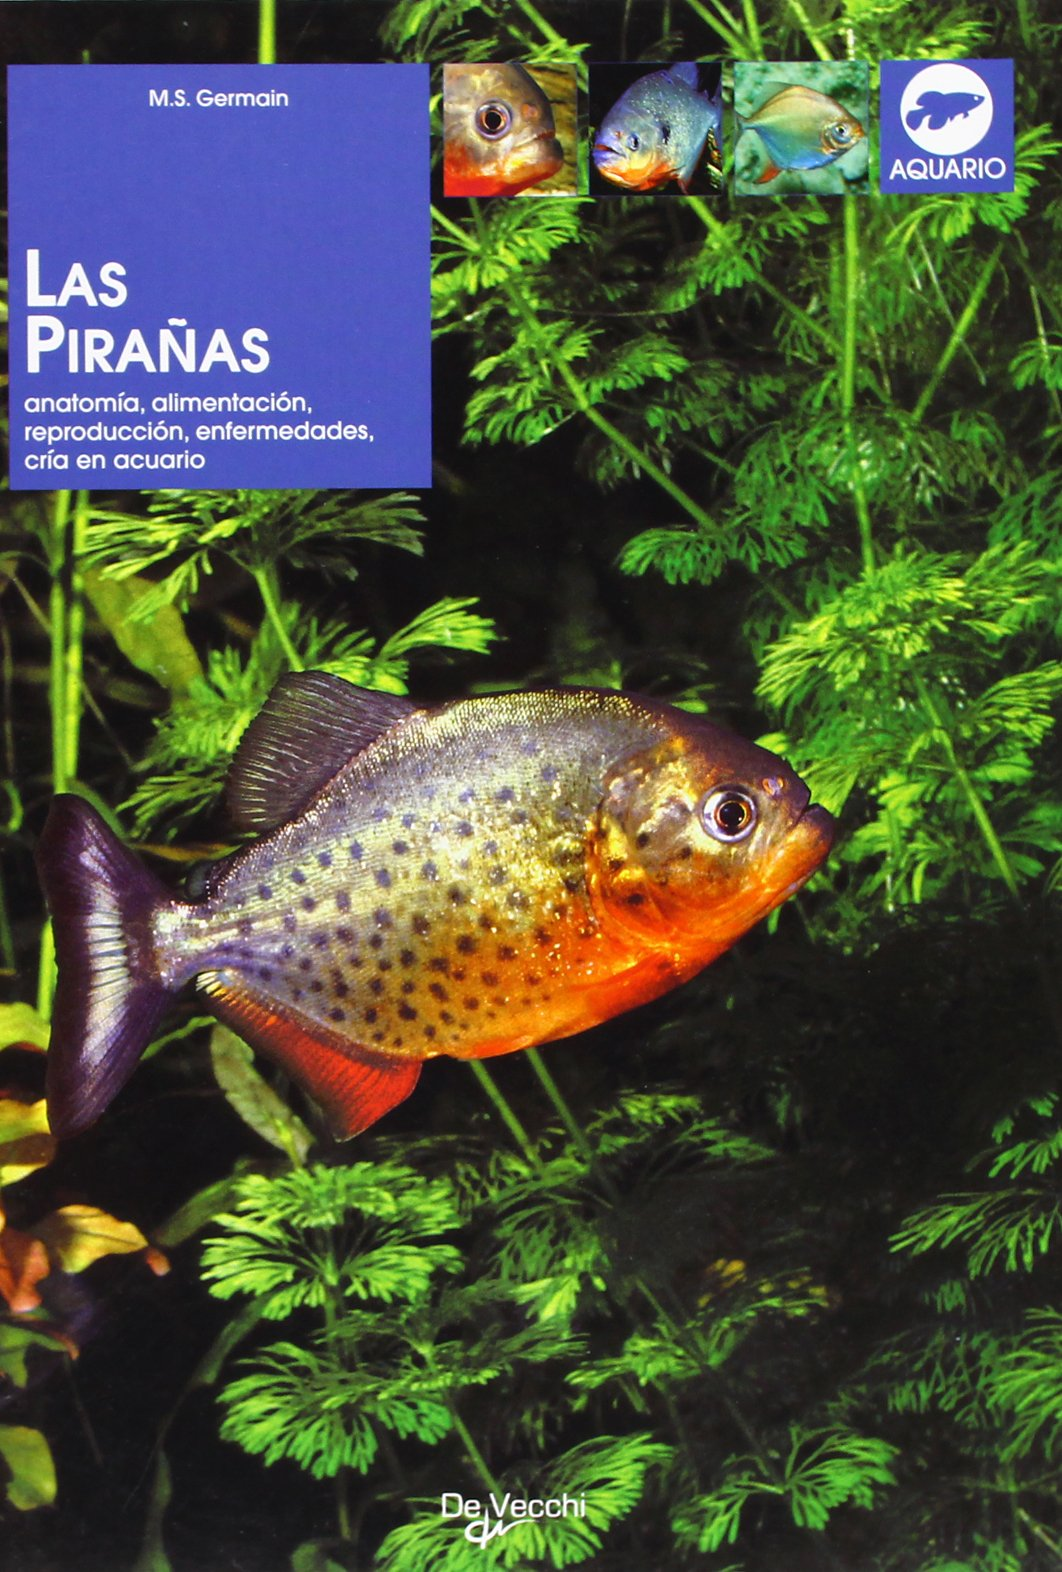 Las piranas (Spanish Edition) (Spanish) Paperback – March 1, 2009